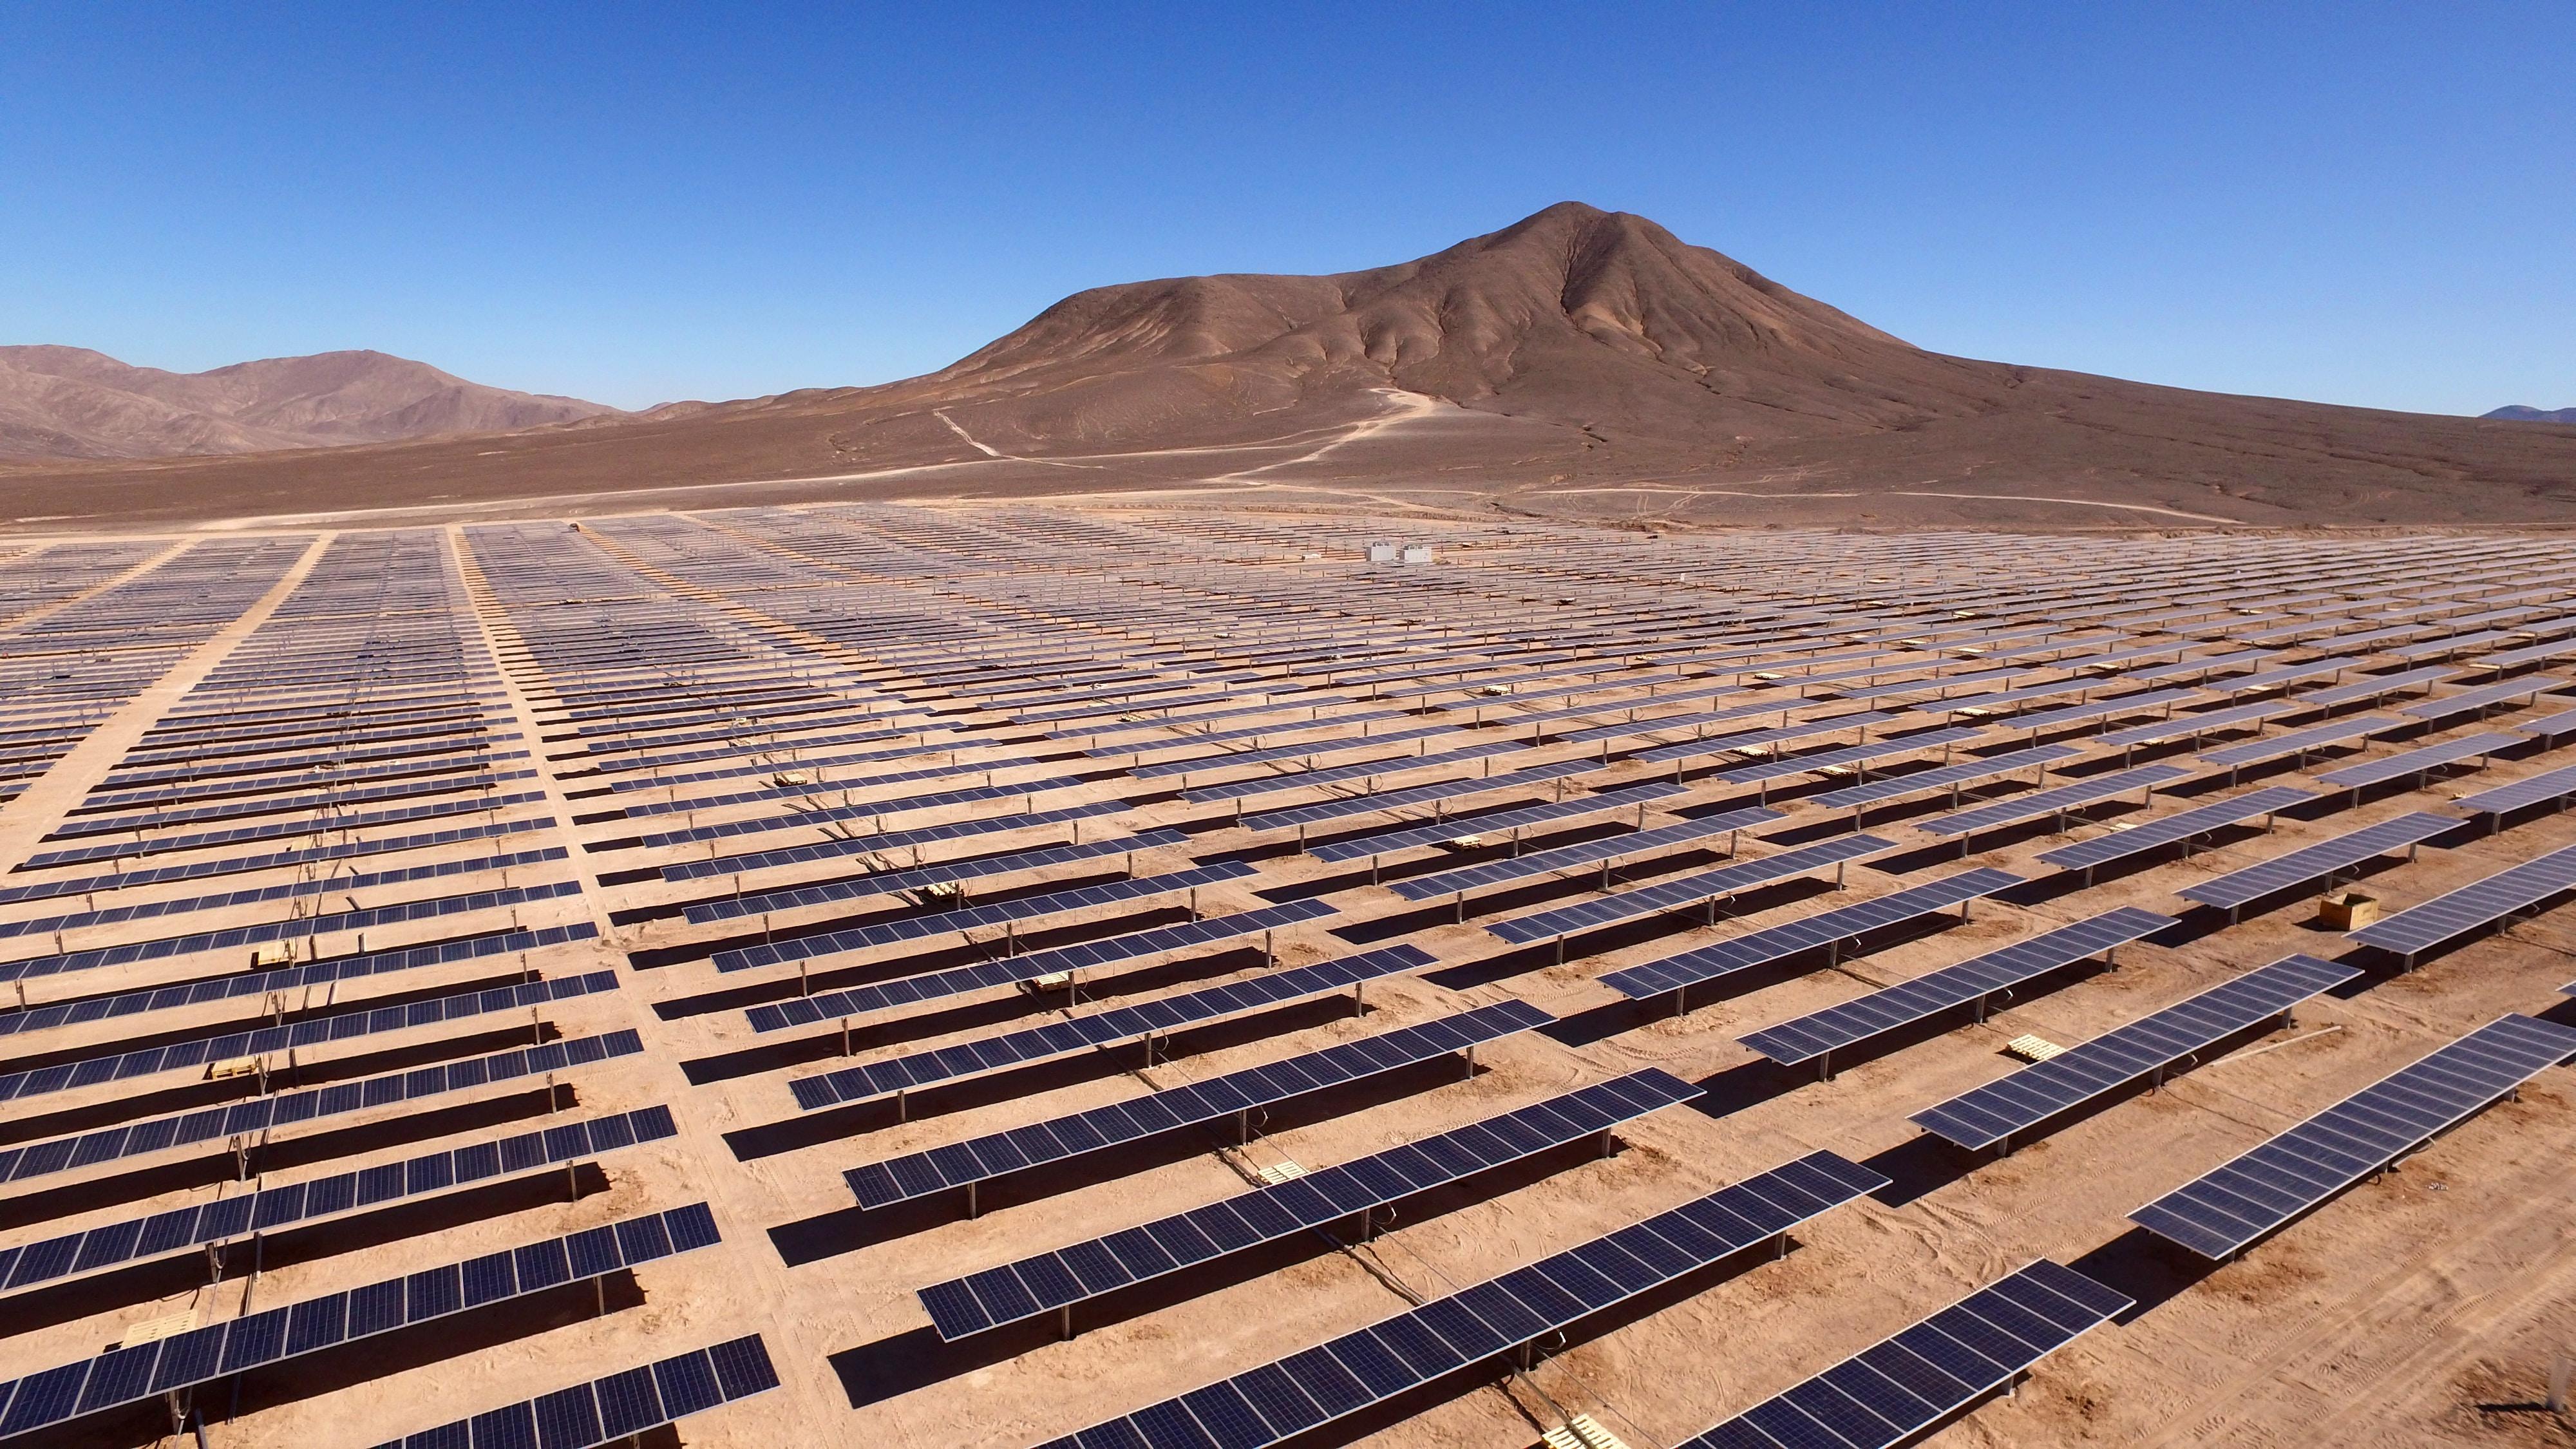 landscape photography of blue solar panels